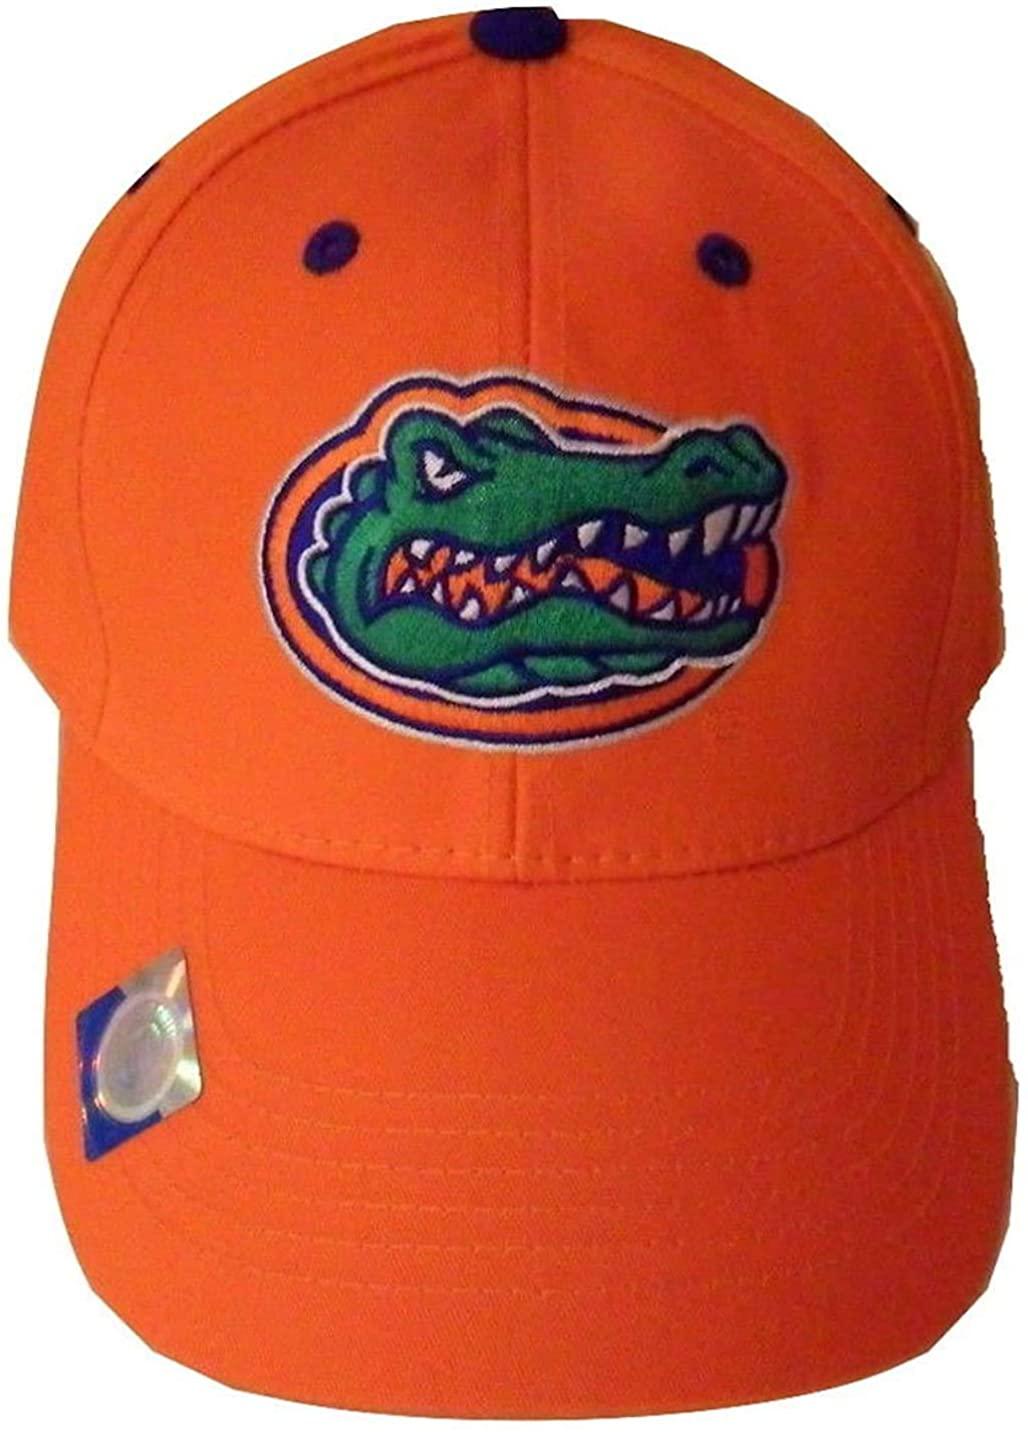 Florida Gators Adjustable Logo Cap - Choose Your Color (Orange)